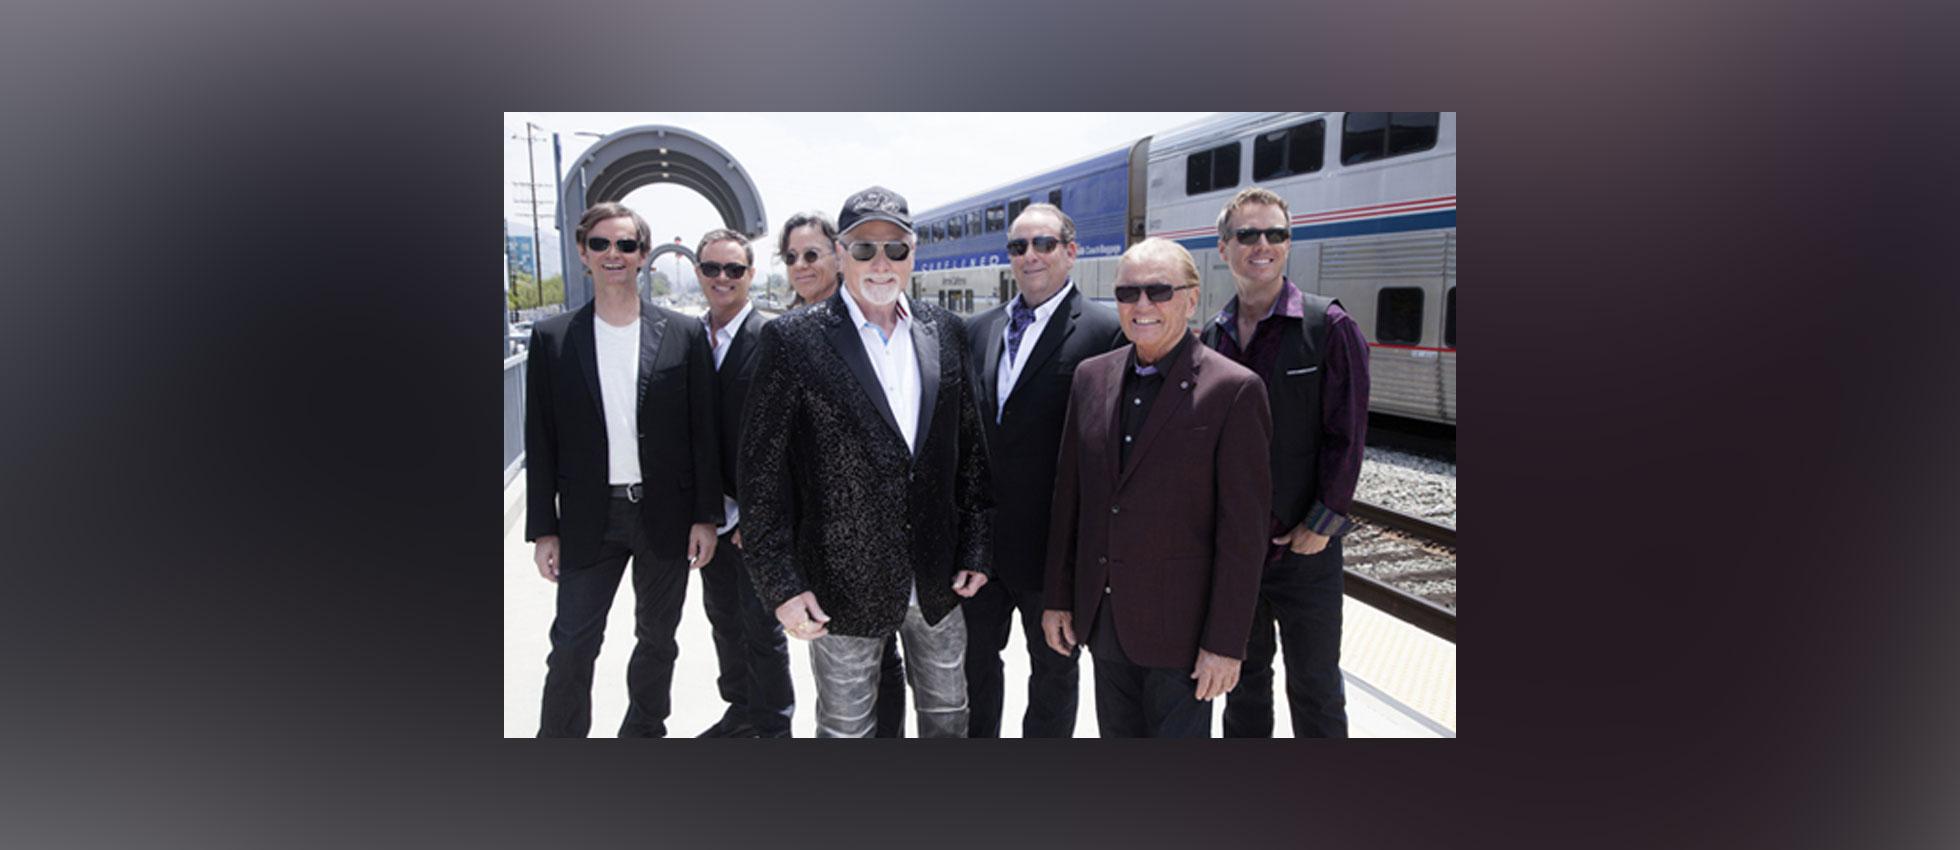 The Beach Boys Sioux Falls Concert